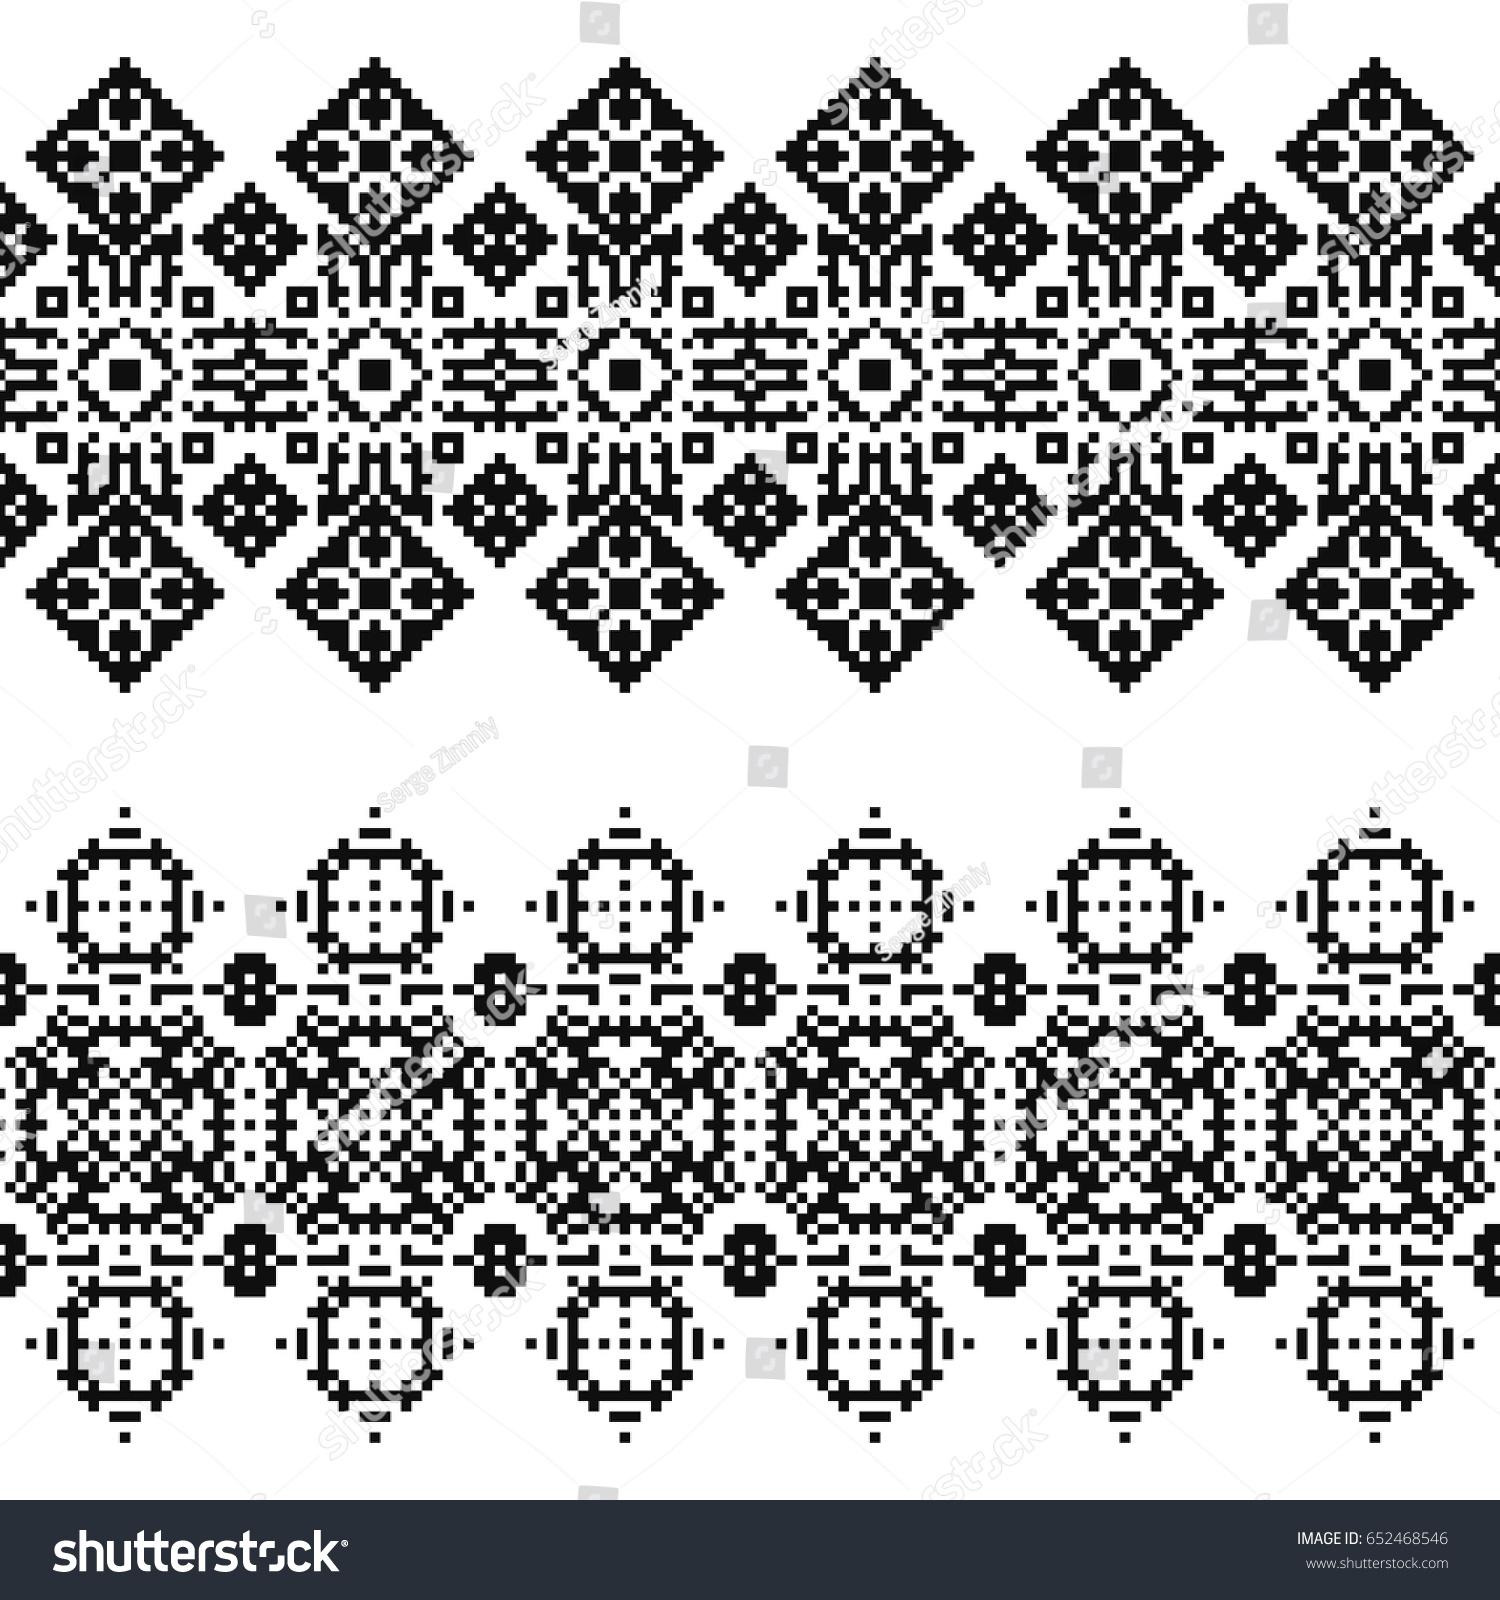 Ethnic geometric pattern. Black and white seamless background. Pixel boho  ornament. Tribal borders